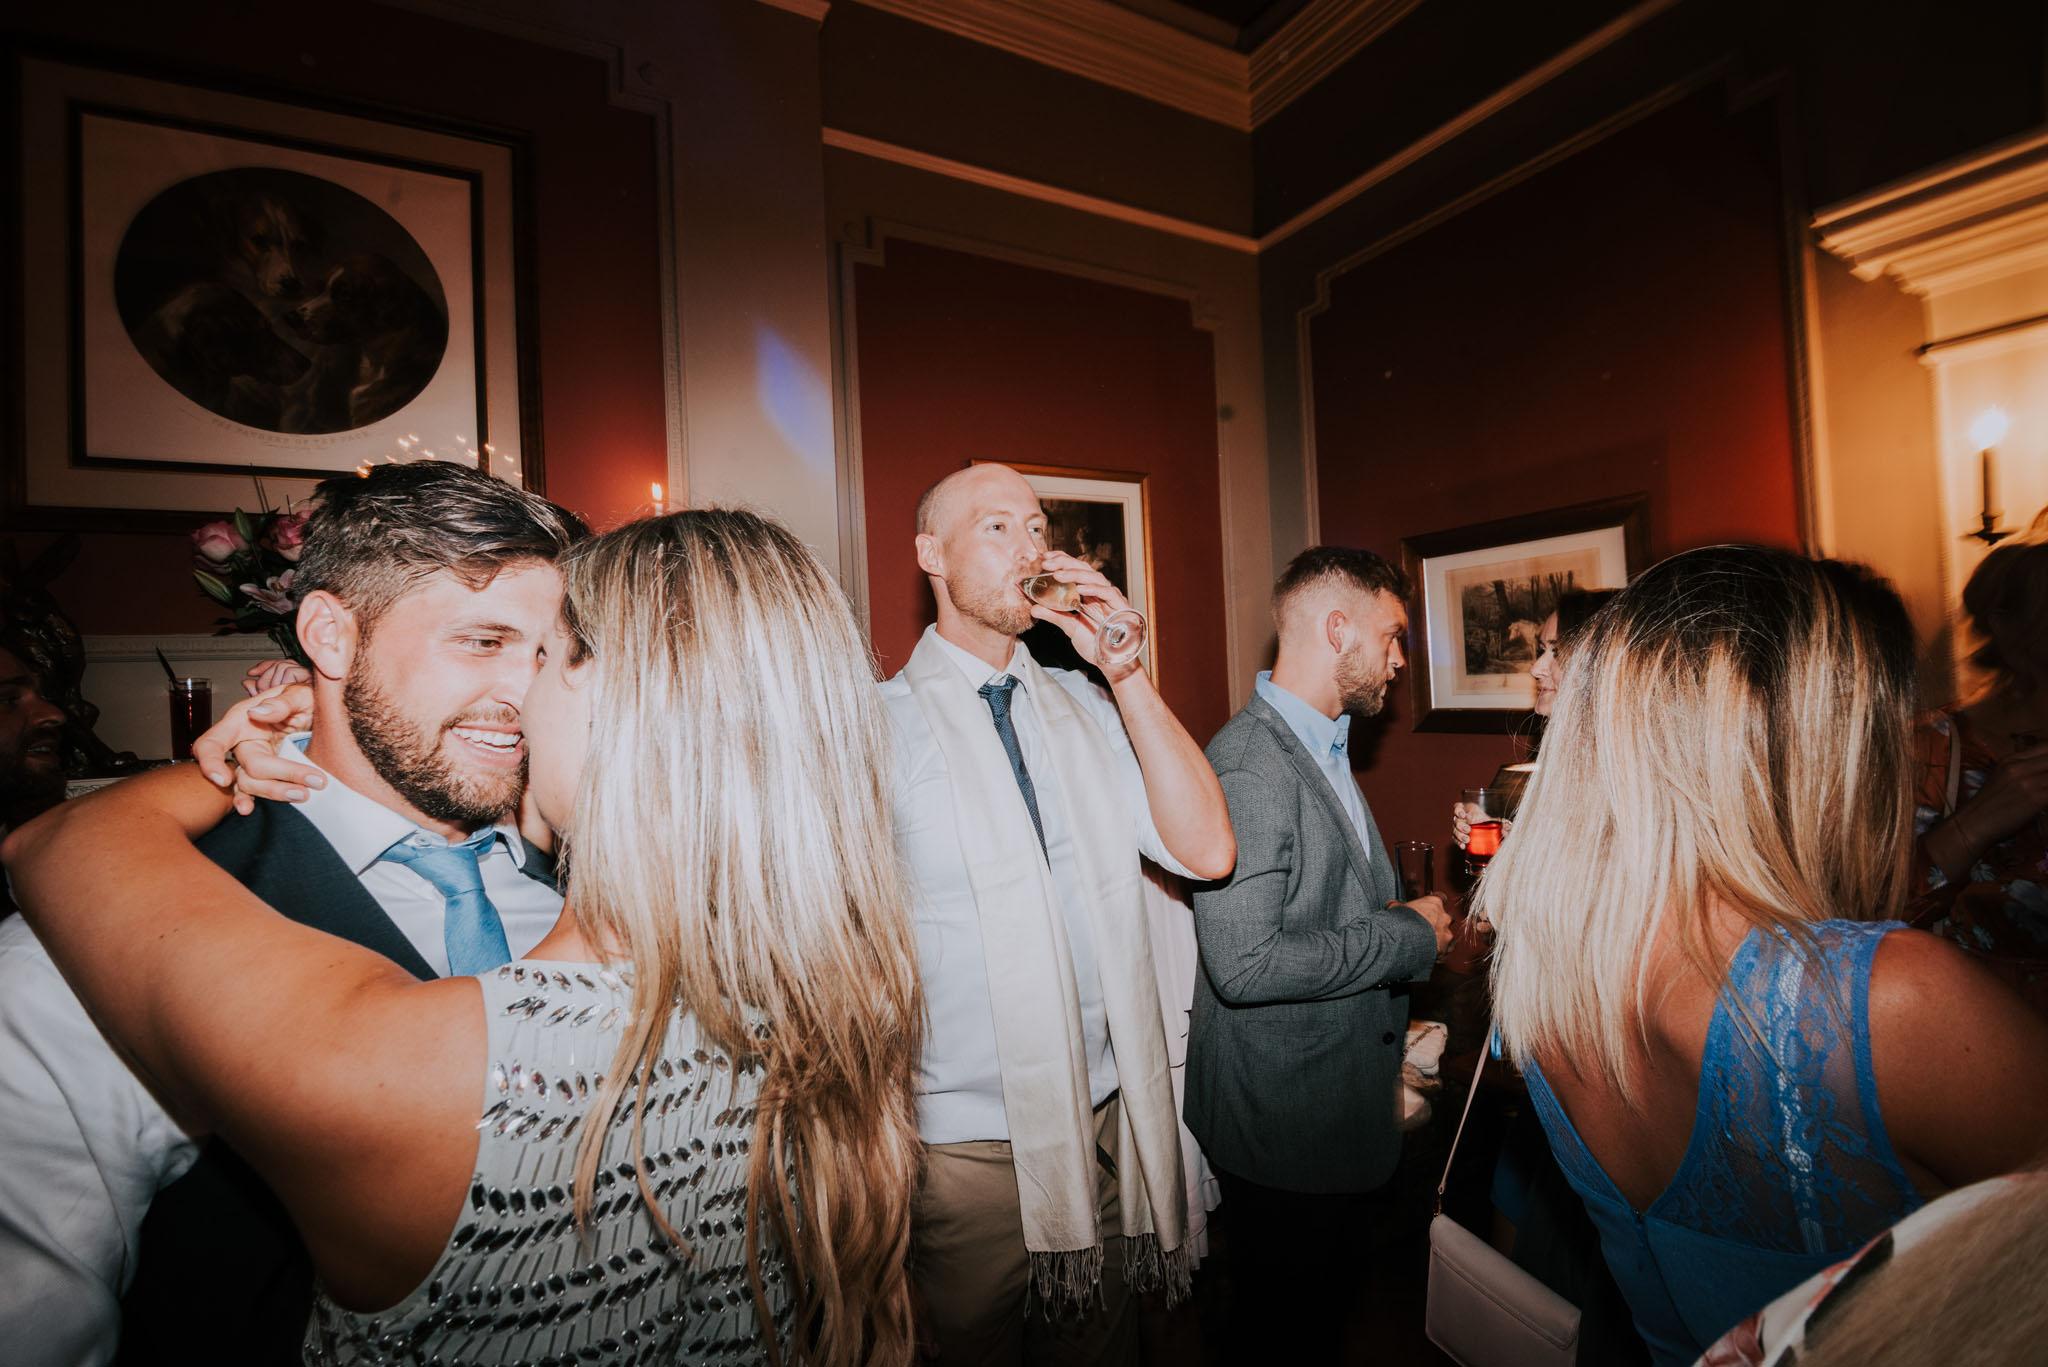 wedding-photographer-glewstone-court-hereford-scott-stockwell-photography492.jpg